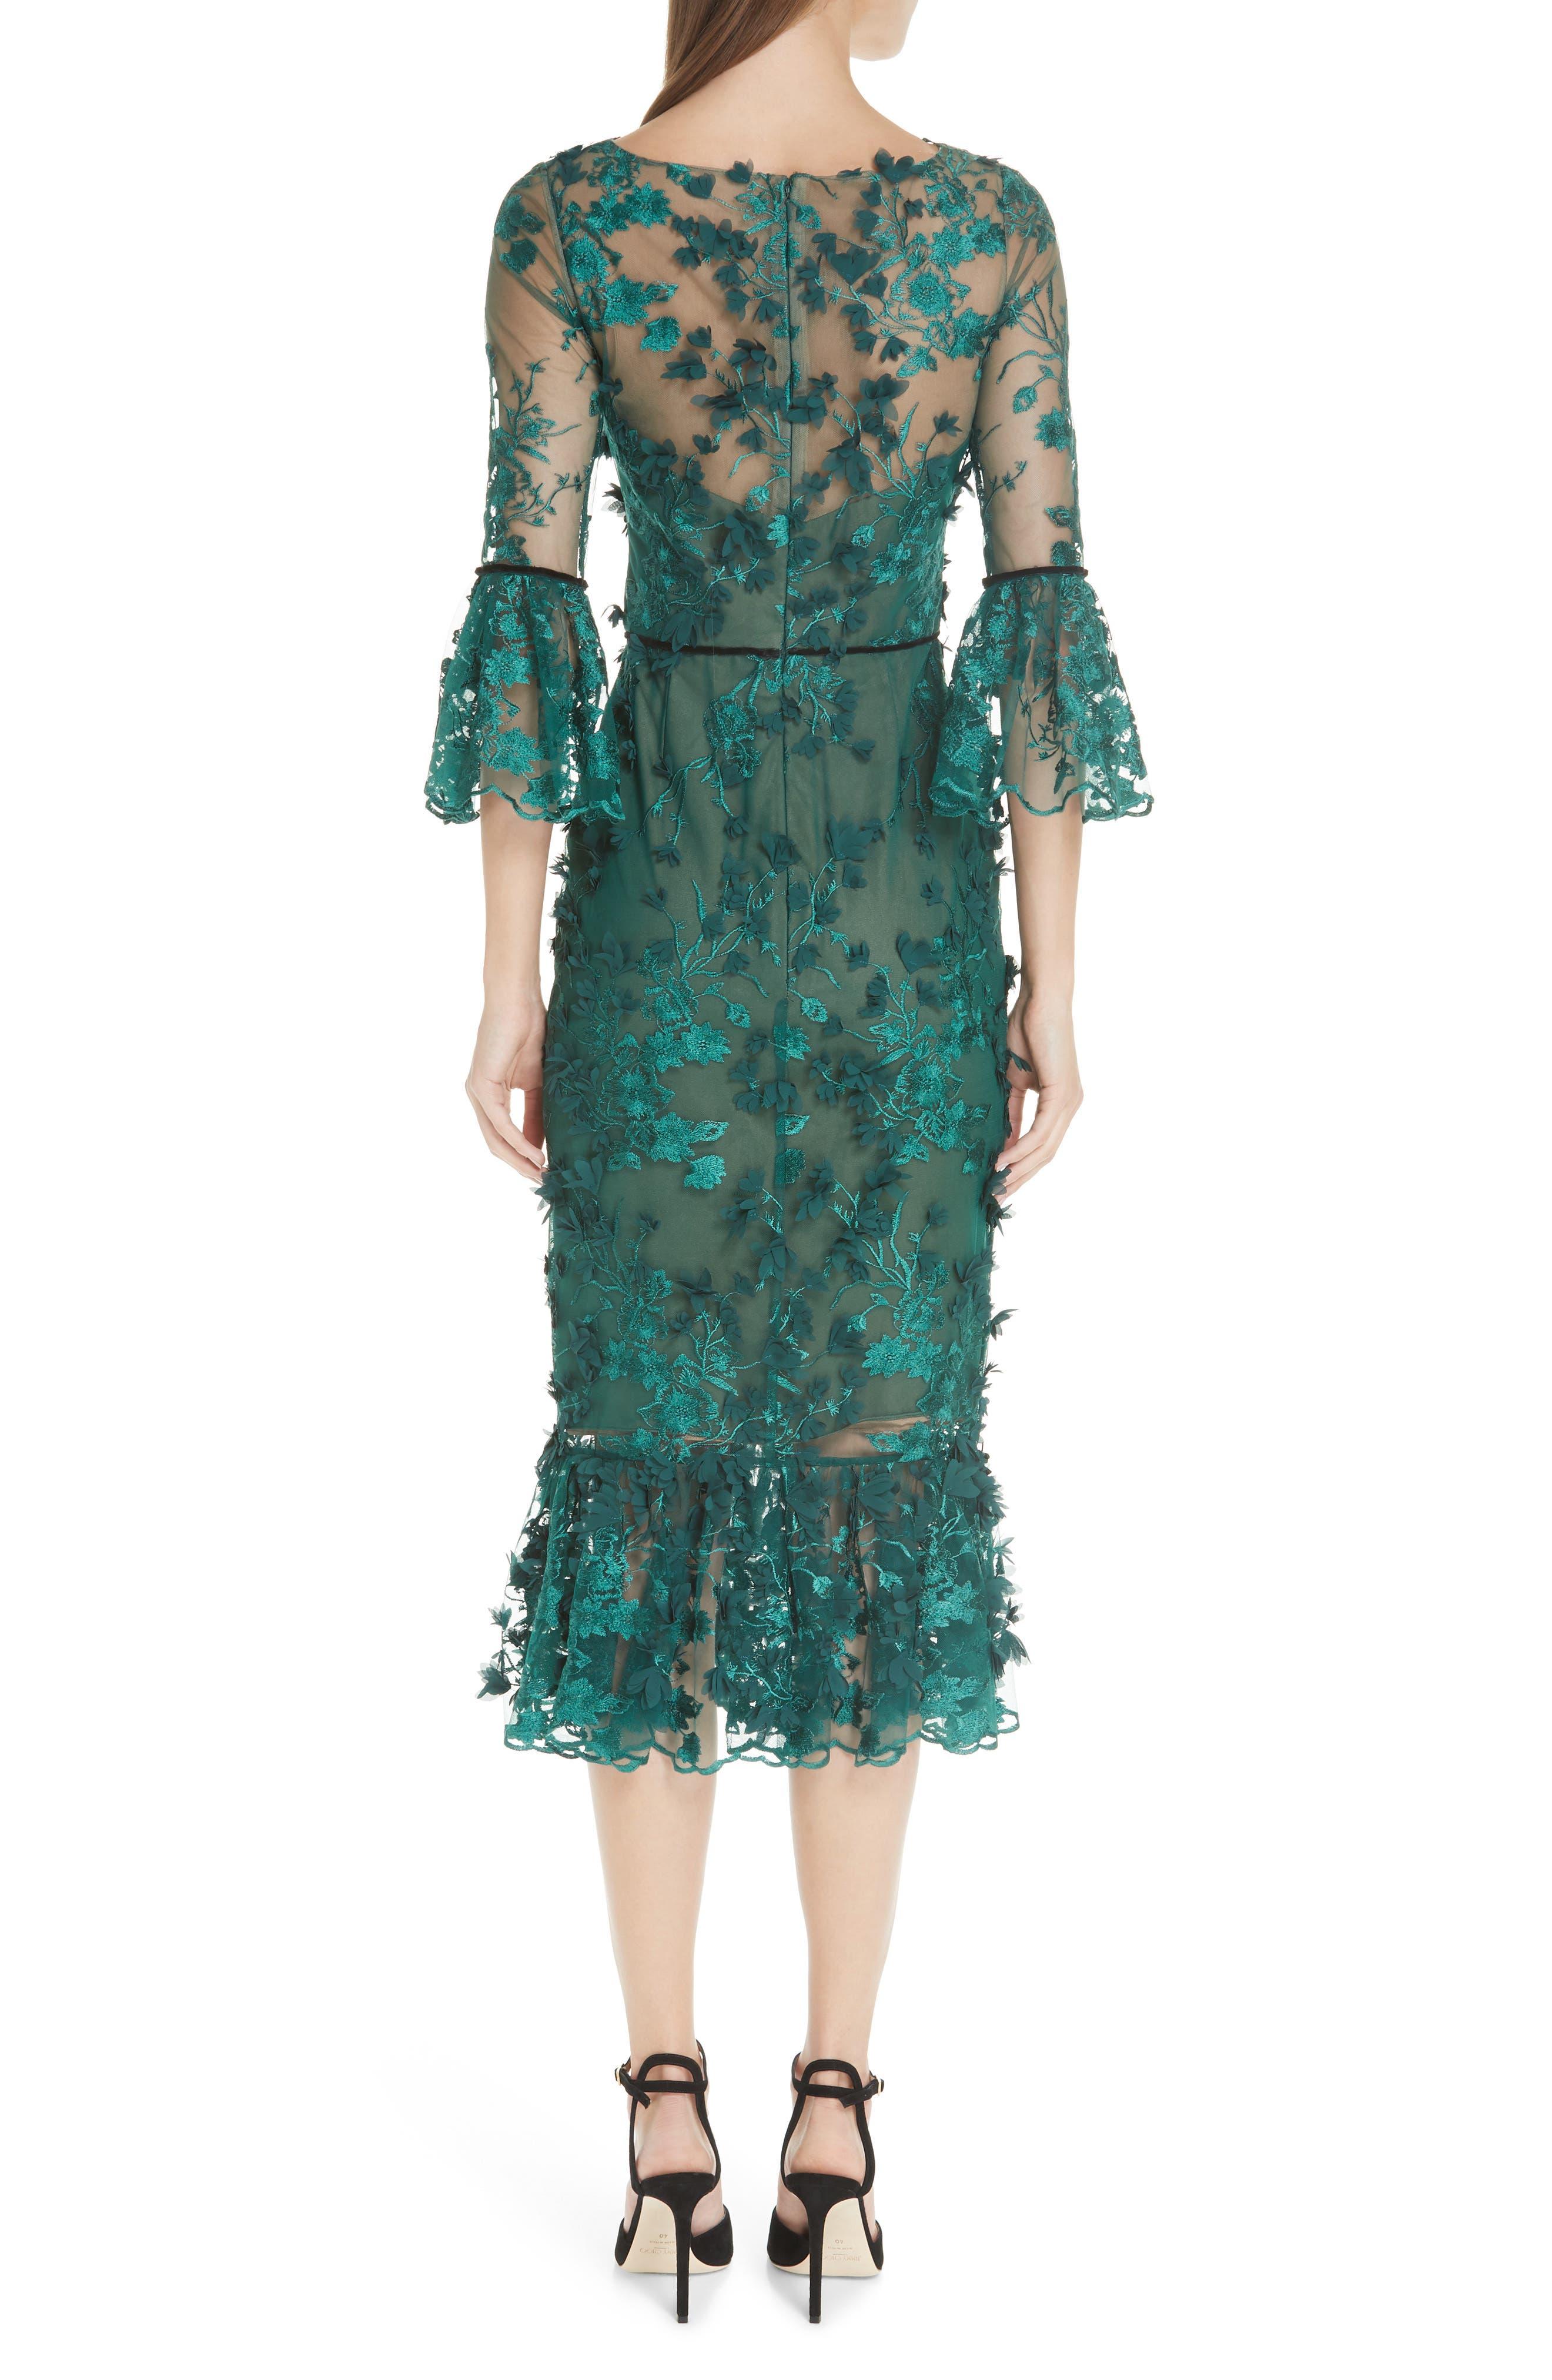 MARCHESA NOTTE,                             Embroidered Ruffle Trim Sheath Dress,                             Alternate thumbnail 2, color,                             300